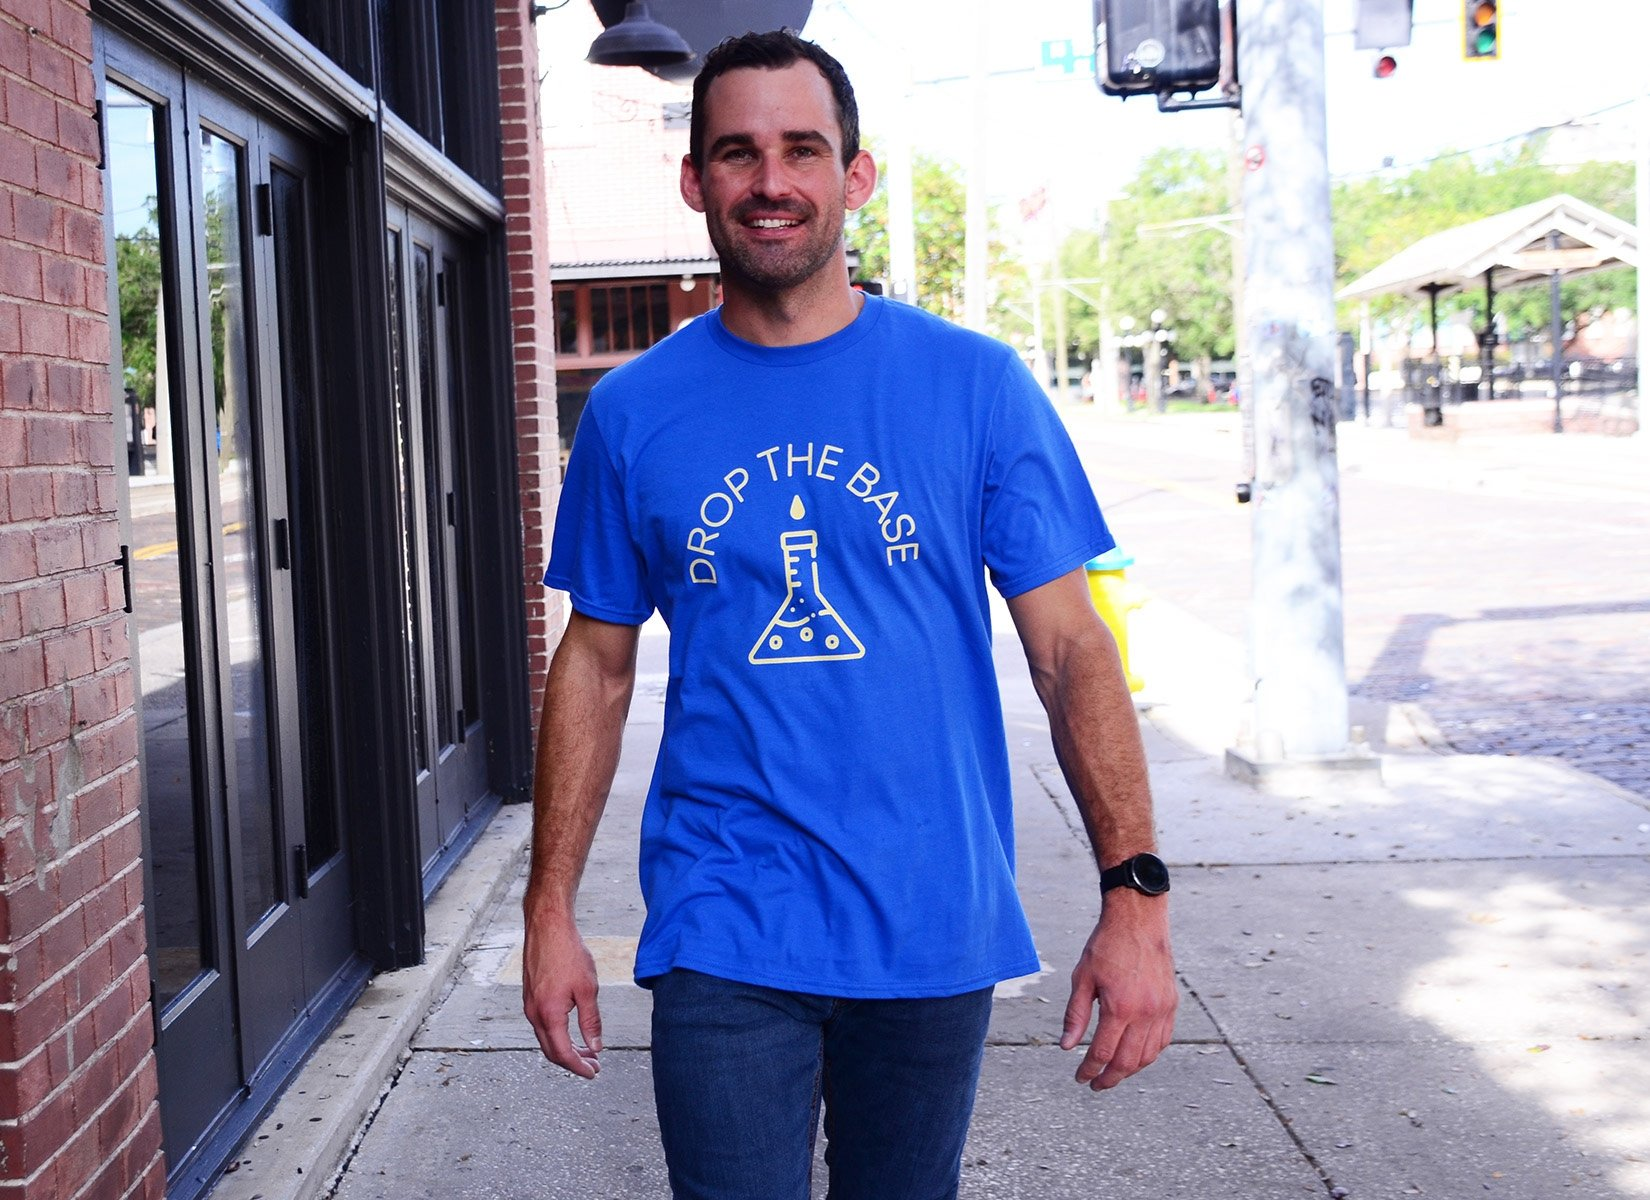 Drop The Base on Mens T-Shirt